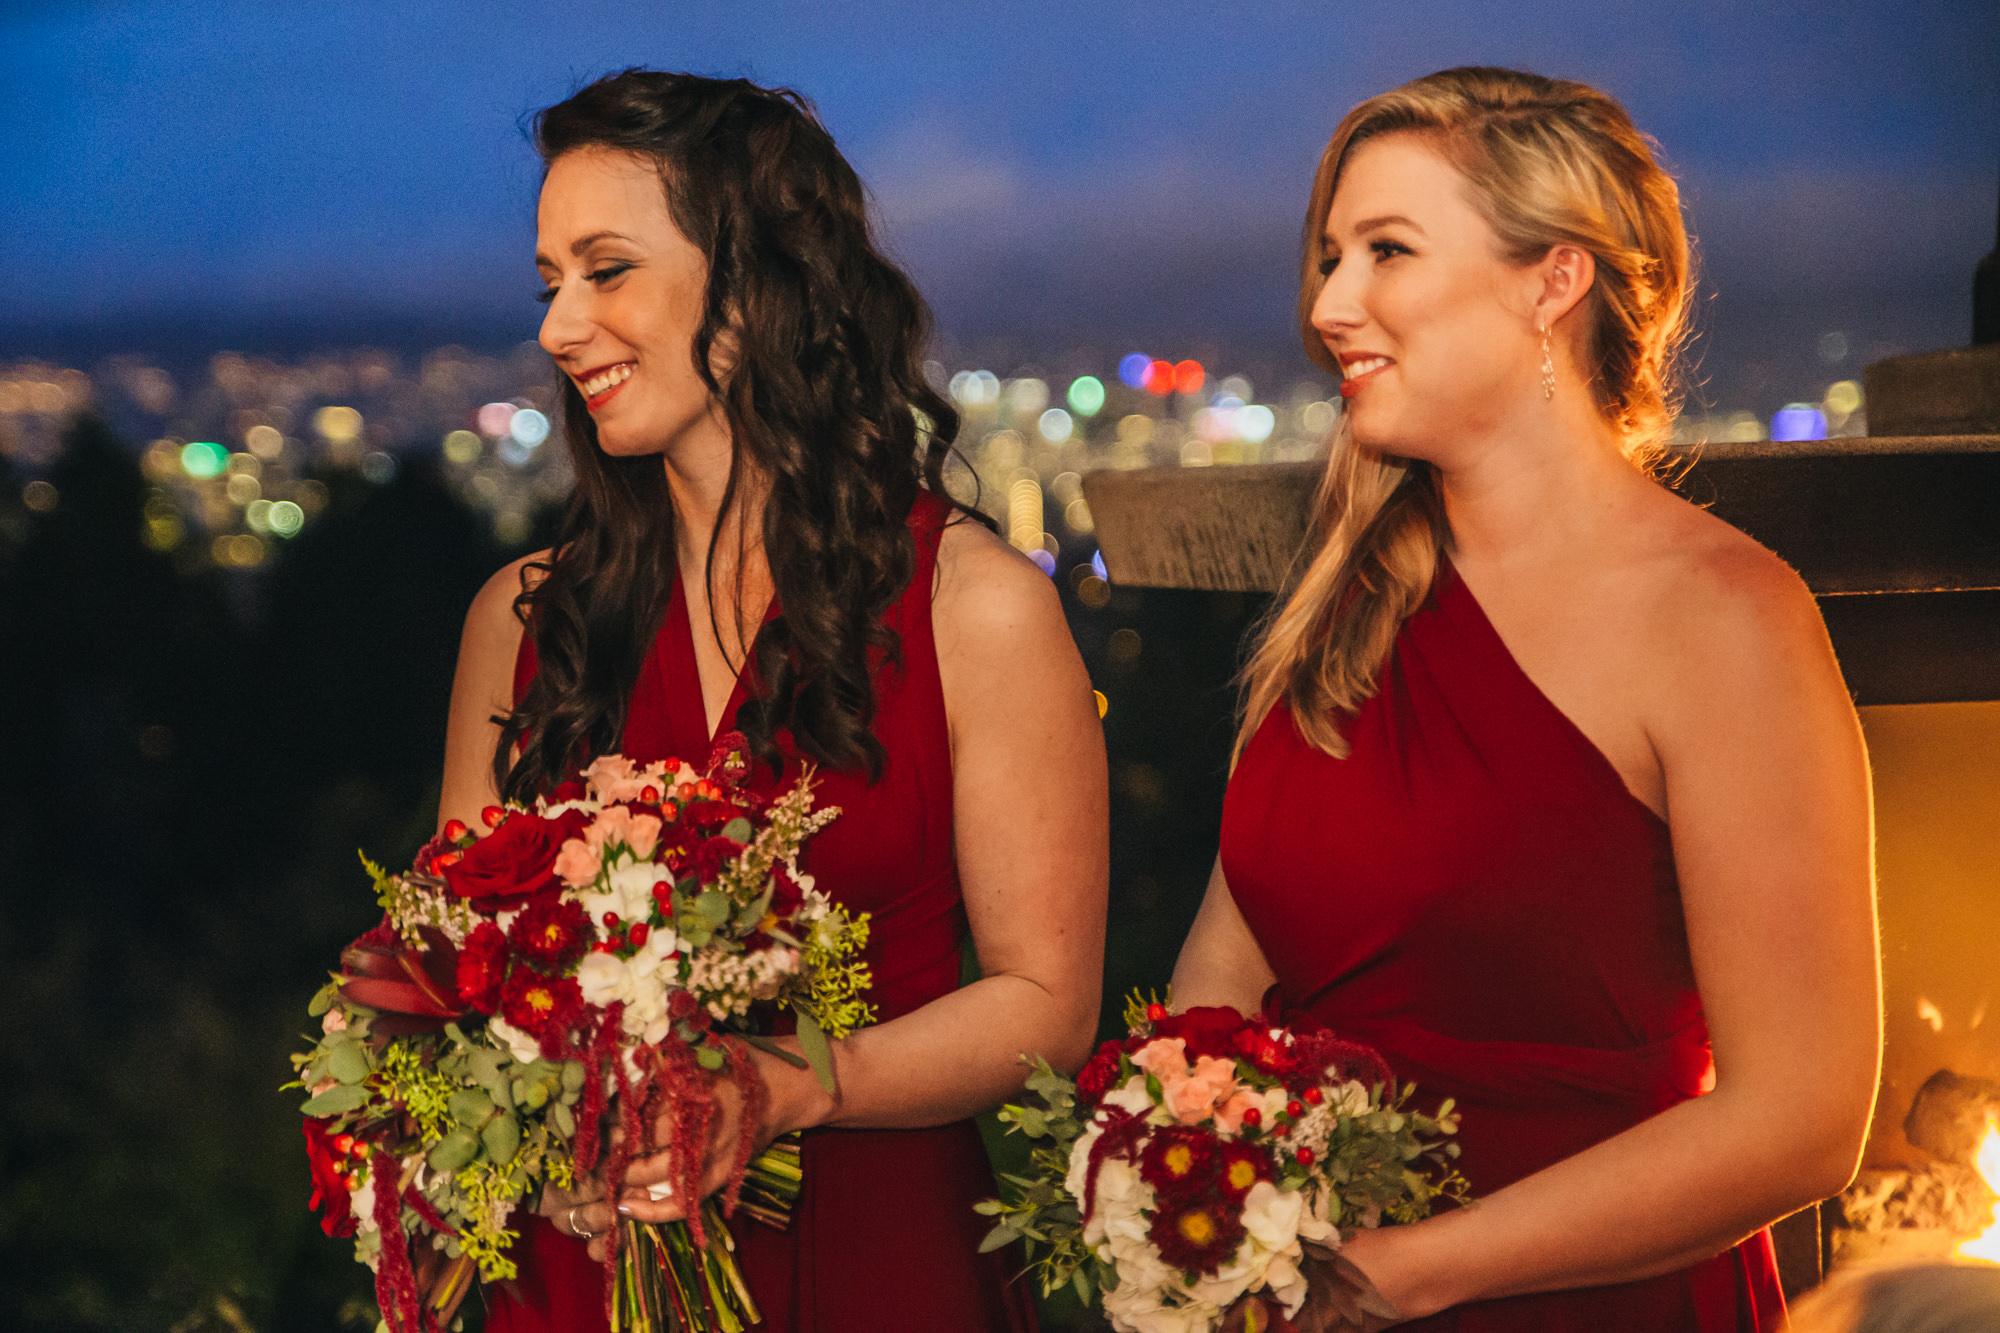 31-seasons-in-the-park-wedding-ceremony.jpg